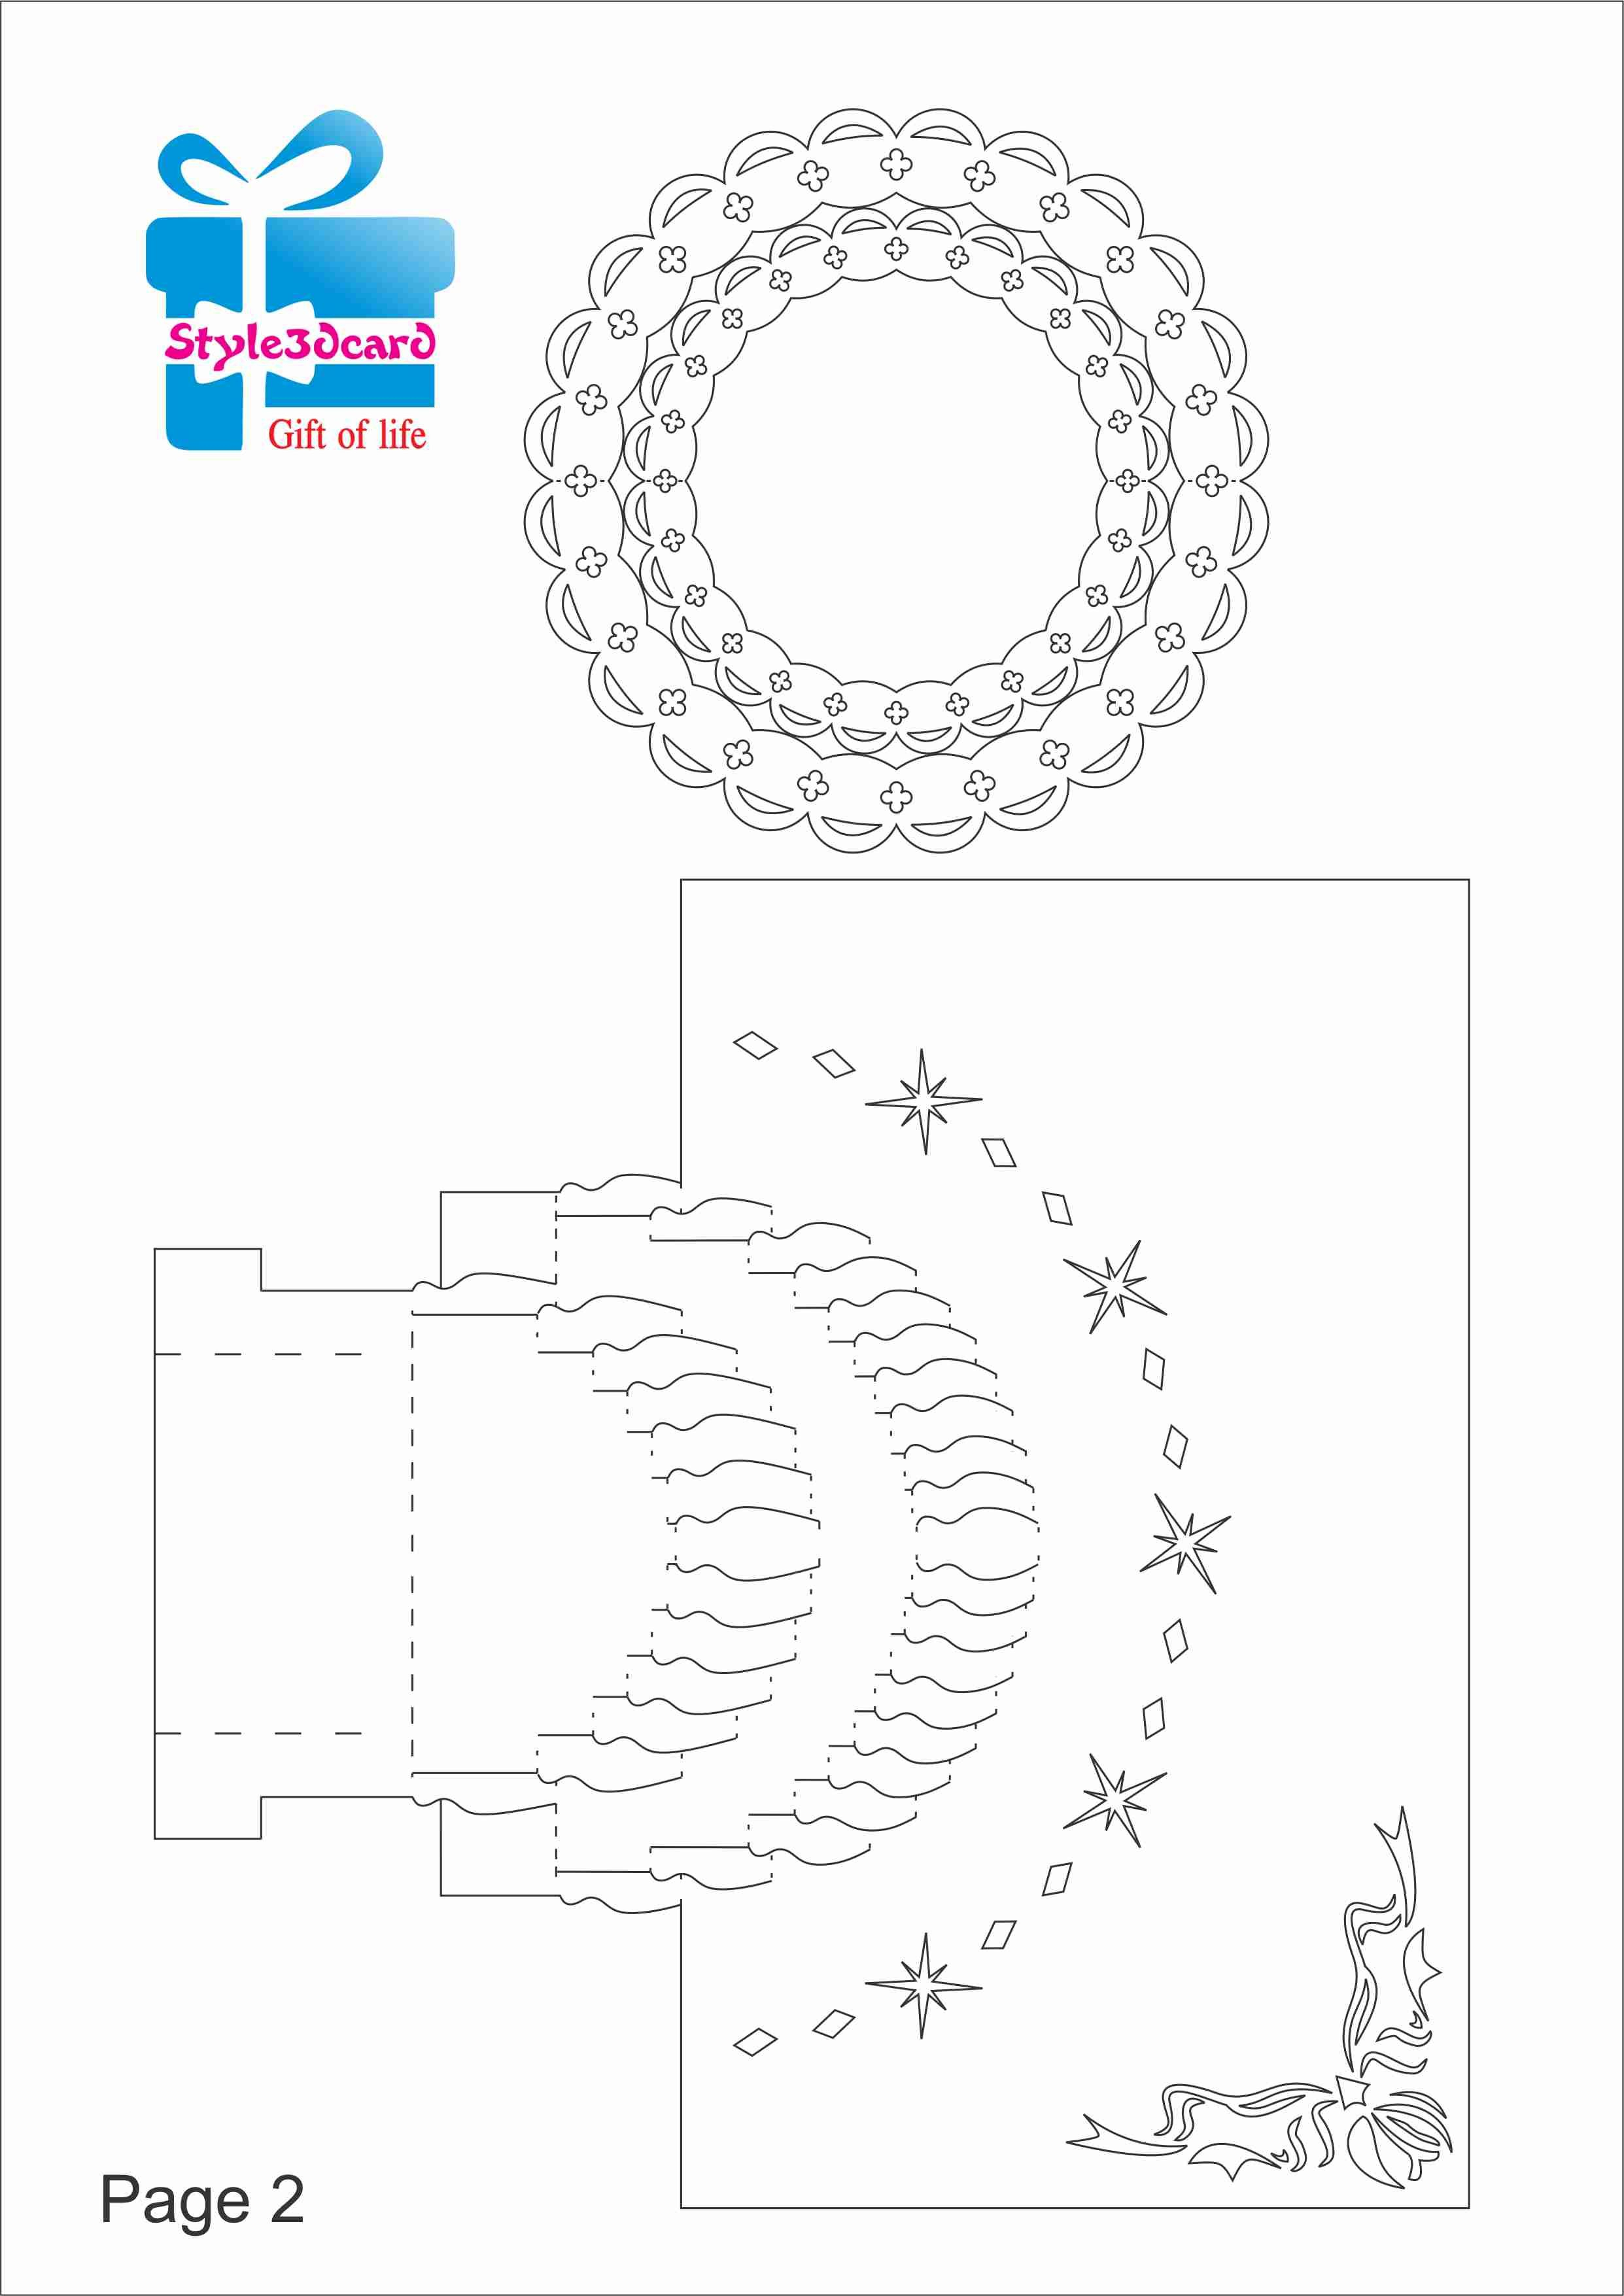 Happy Birthday-Cake-3D-Pop-Up-Greeting-Card/ Kirigami Pattern 2 | 1 - Free Printable Kirigami Pop Up Card Patterns